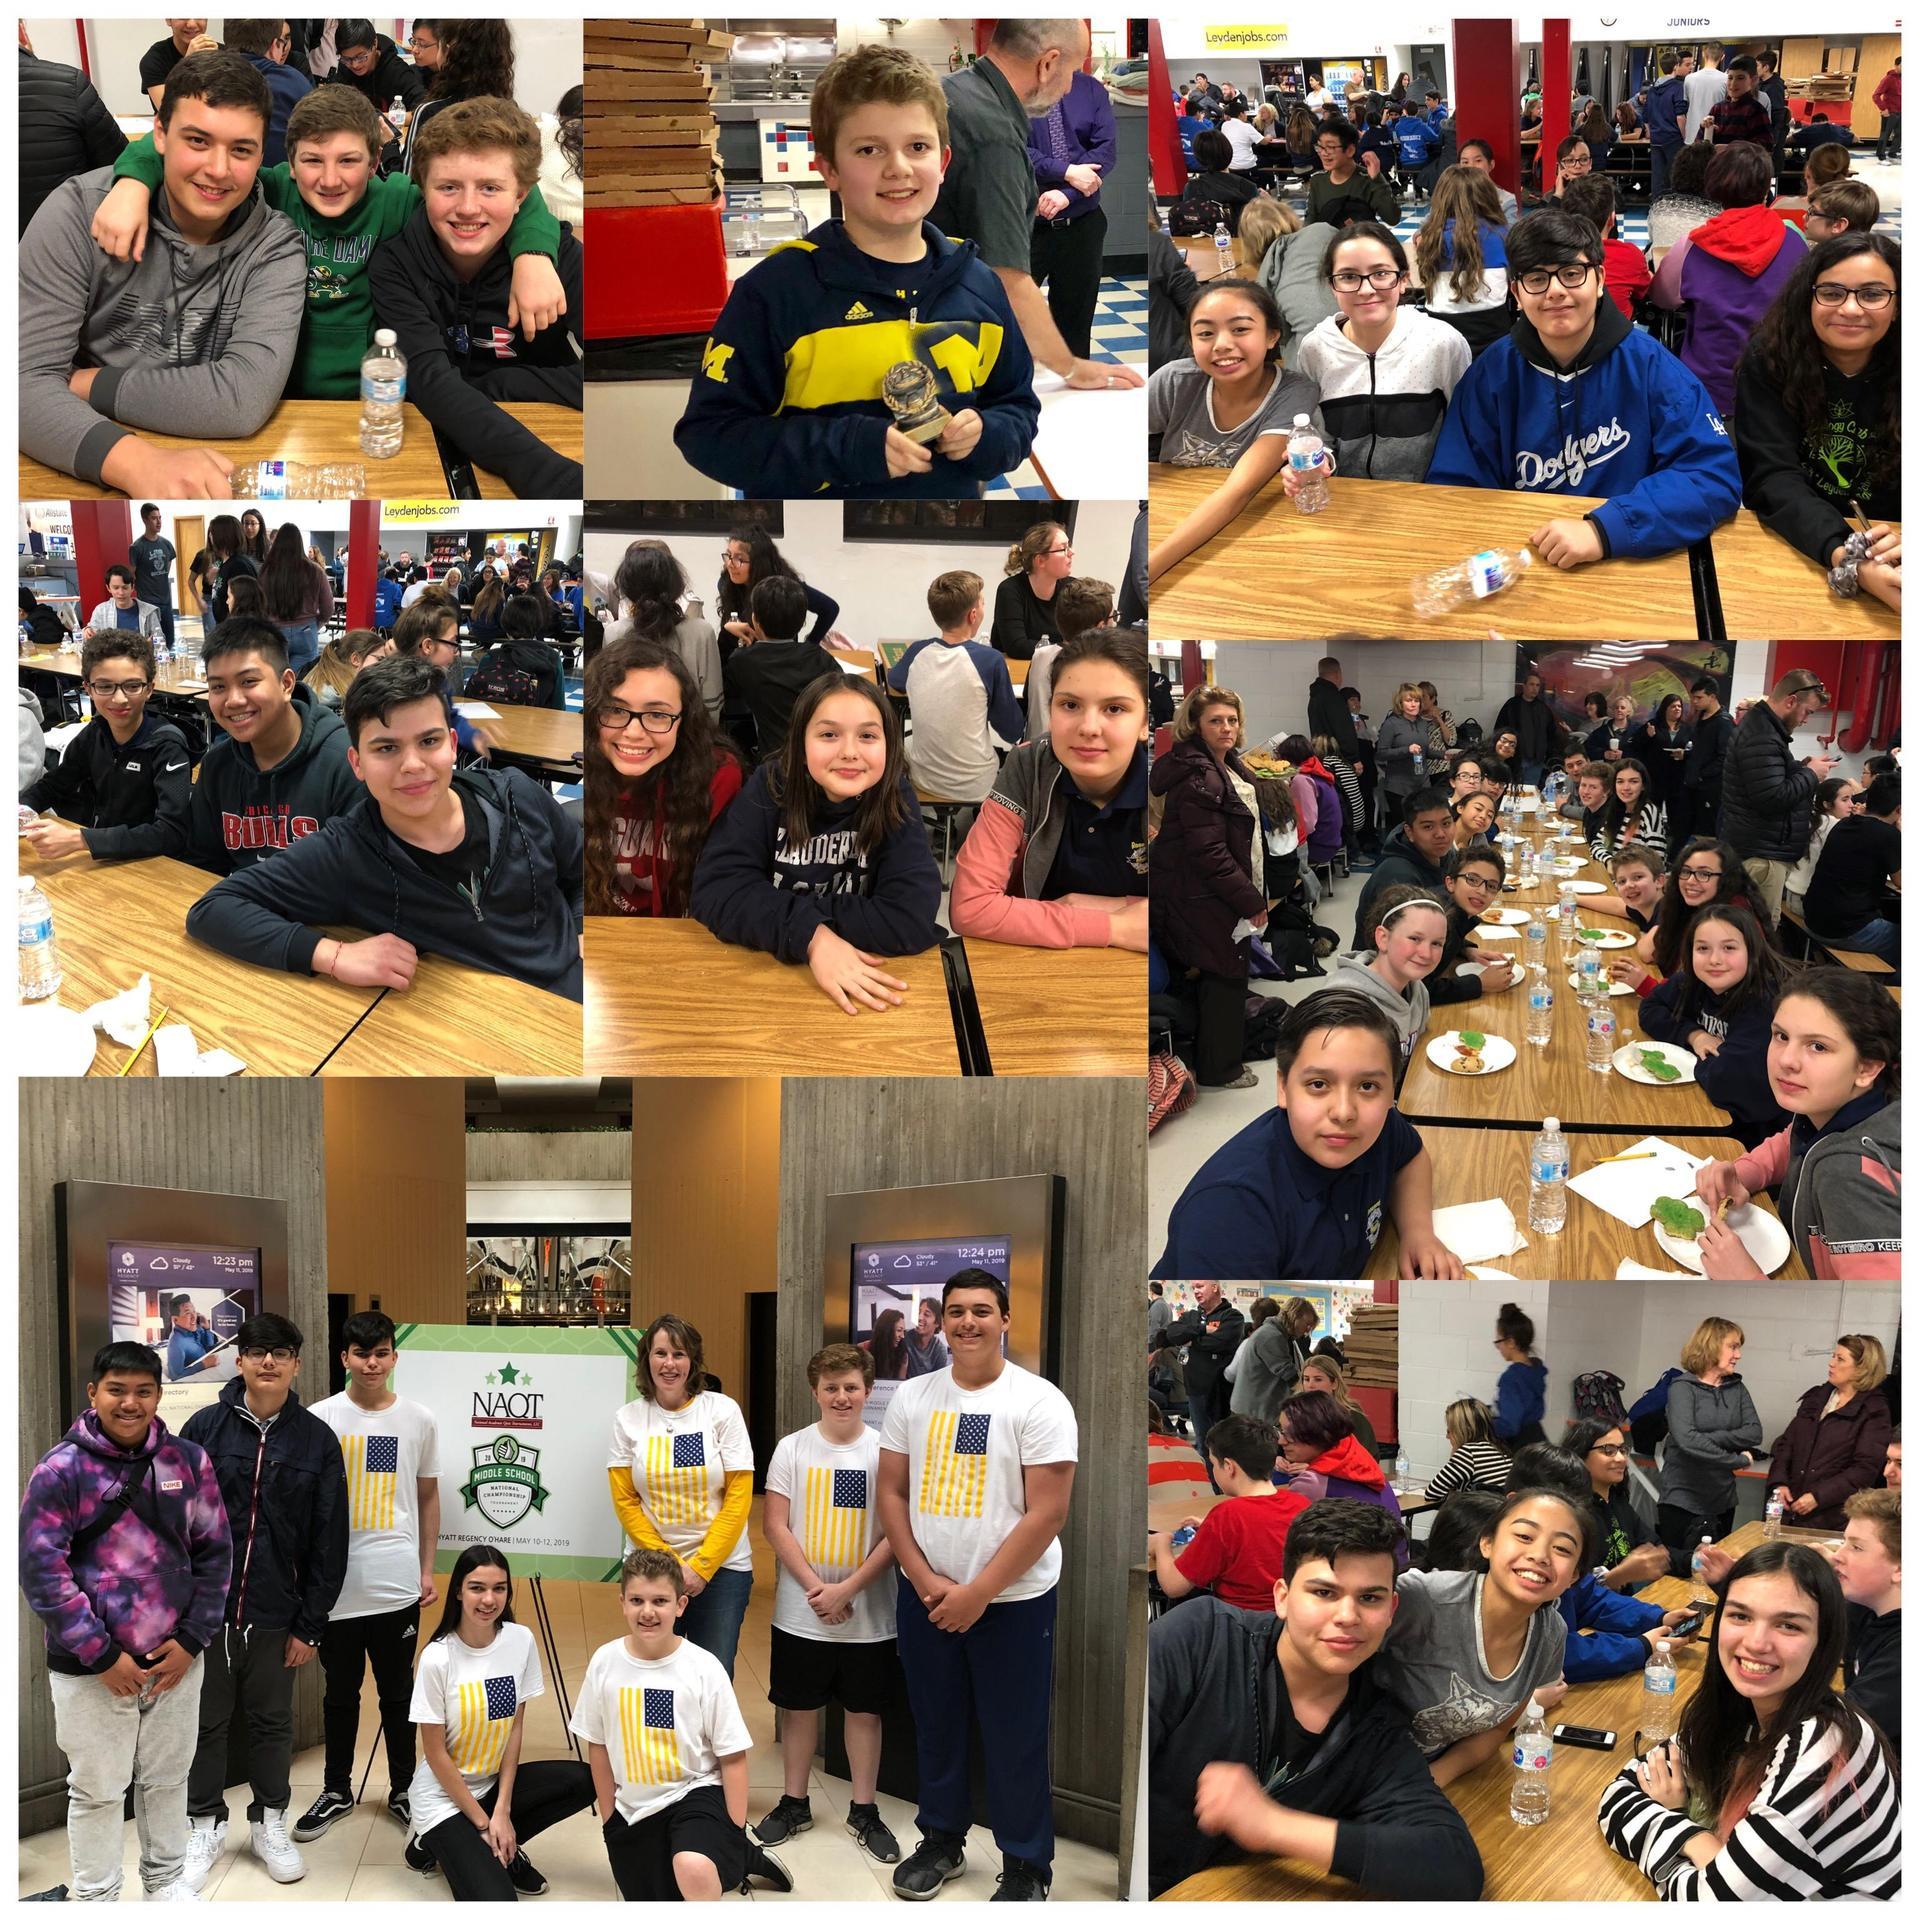 Scholastic Bowl 2019 Collage